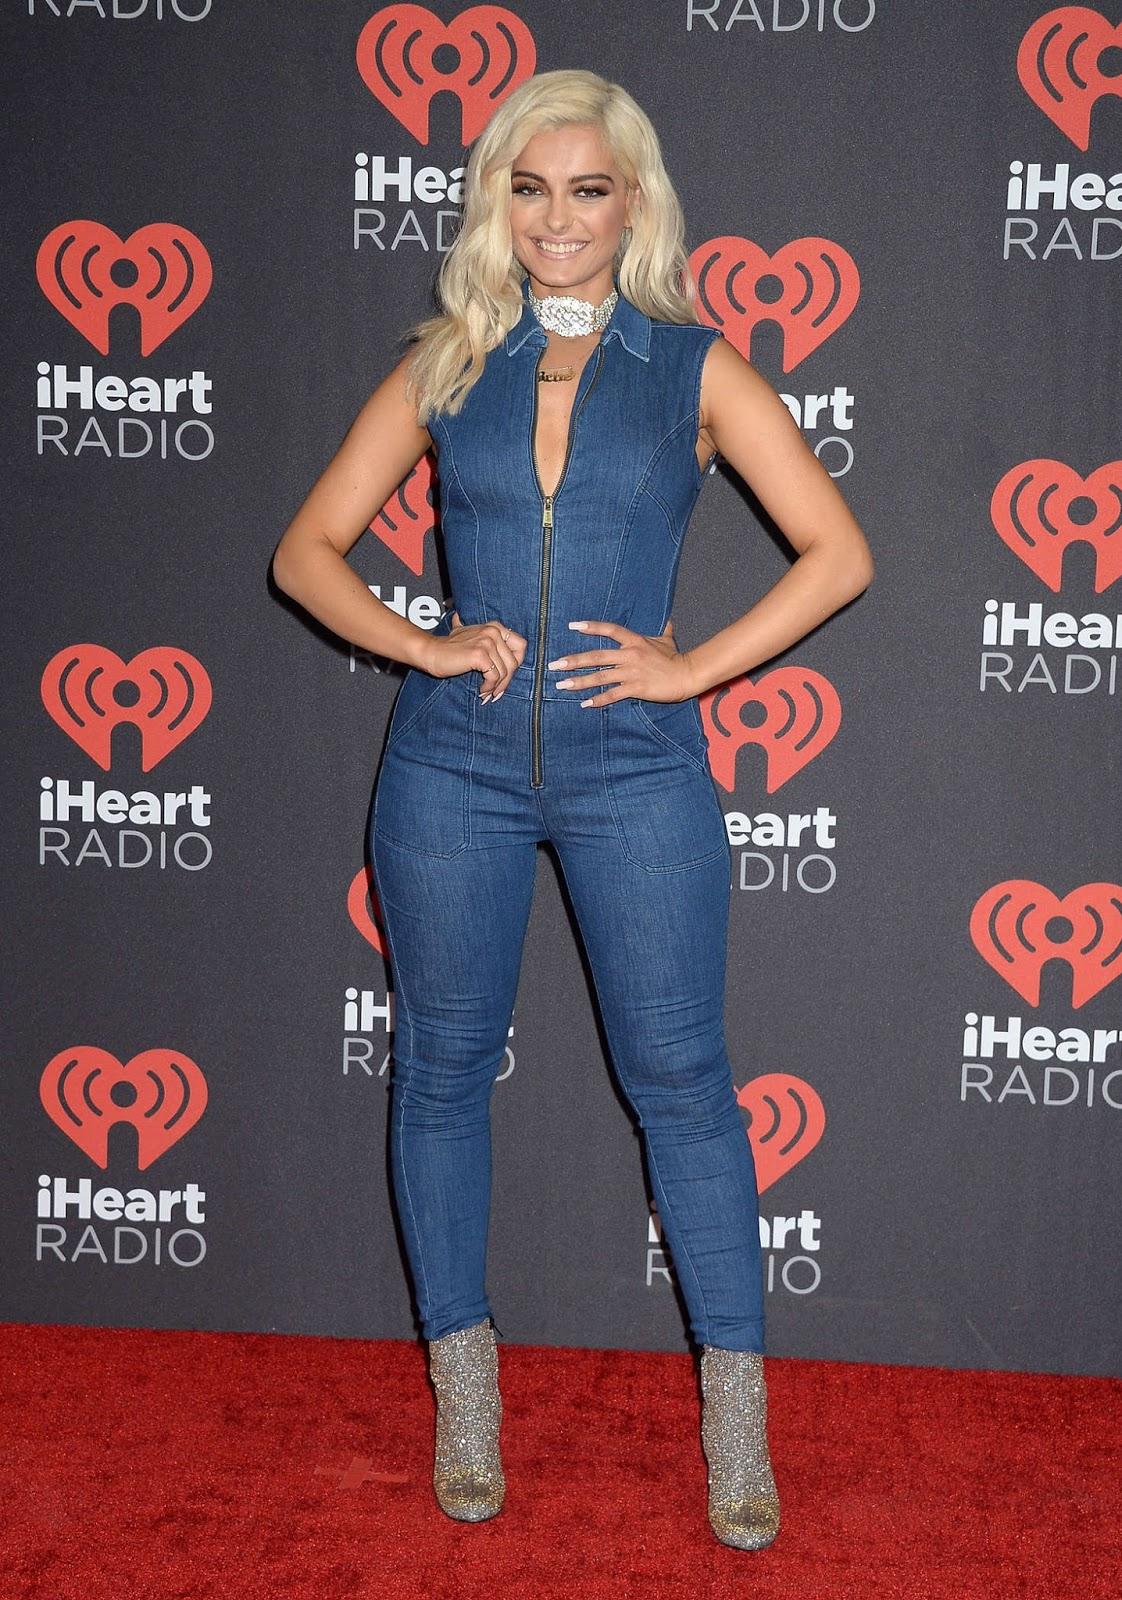 Bebe Rexha at 2016 iHeartRadio Music Festival